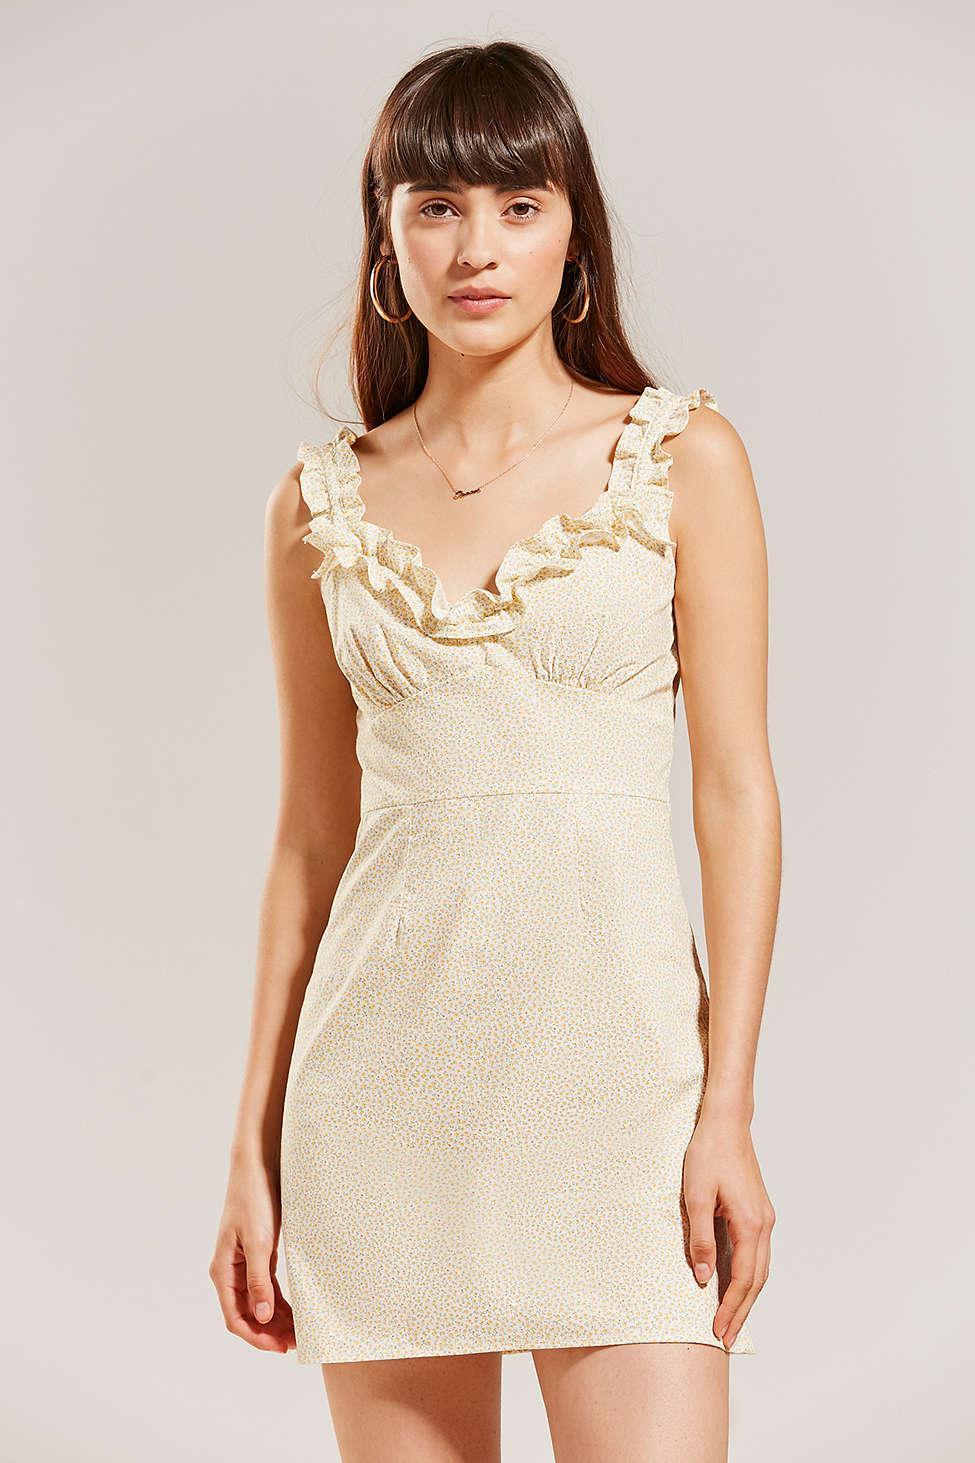 6a0d8990715c Lyst - Lykke Wullf Dolores Ruffle Mini Dress in Yellow